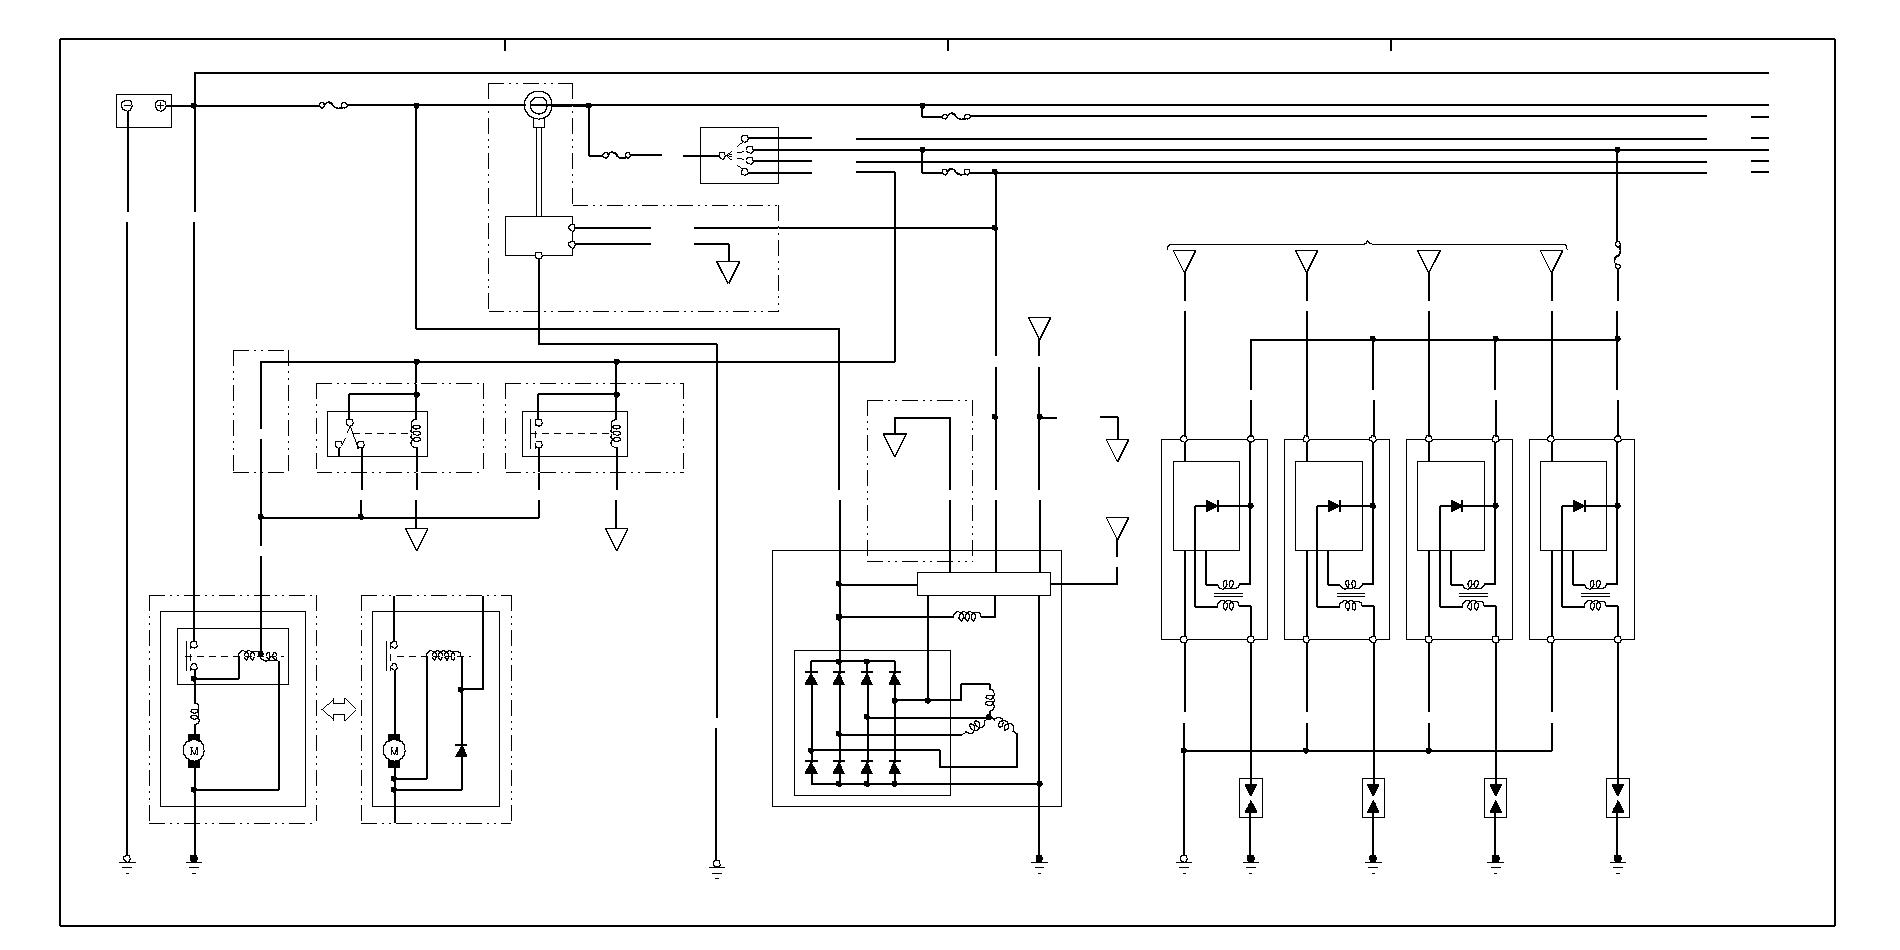 2003 honda crv wiring diagram